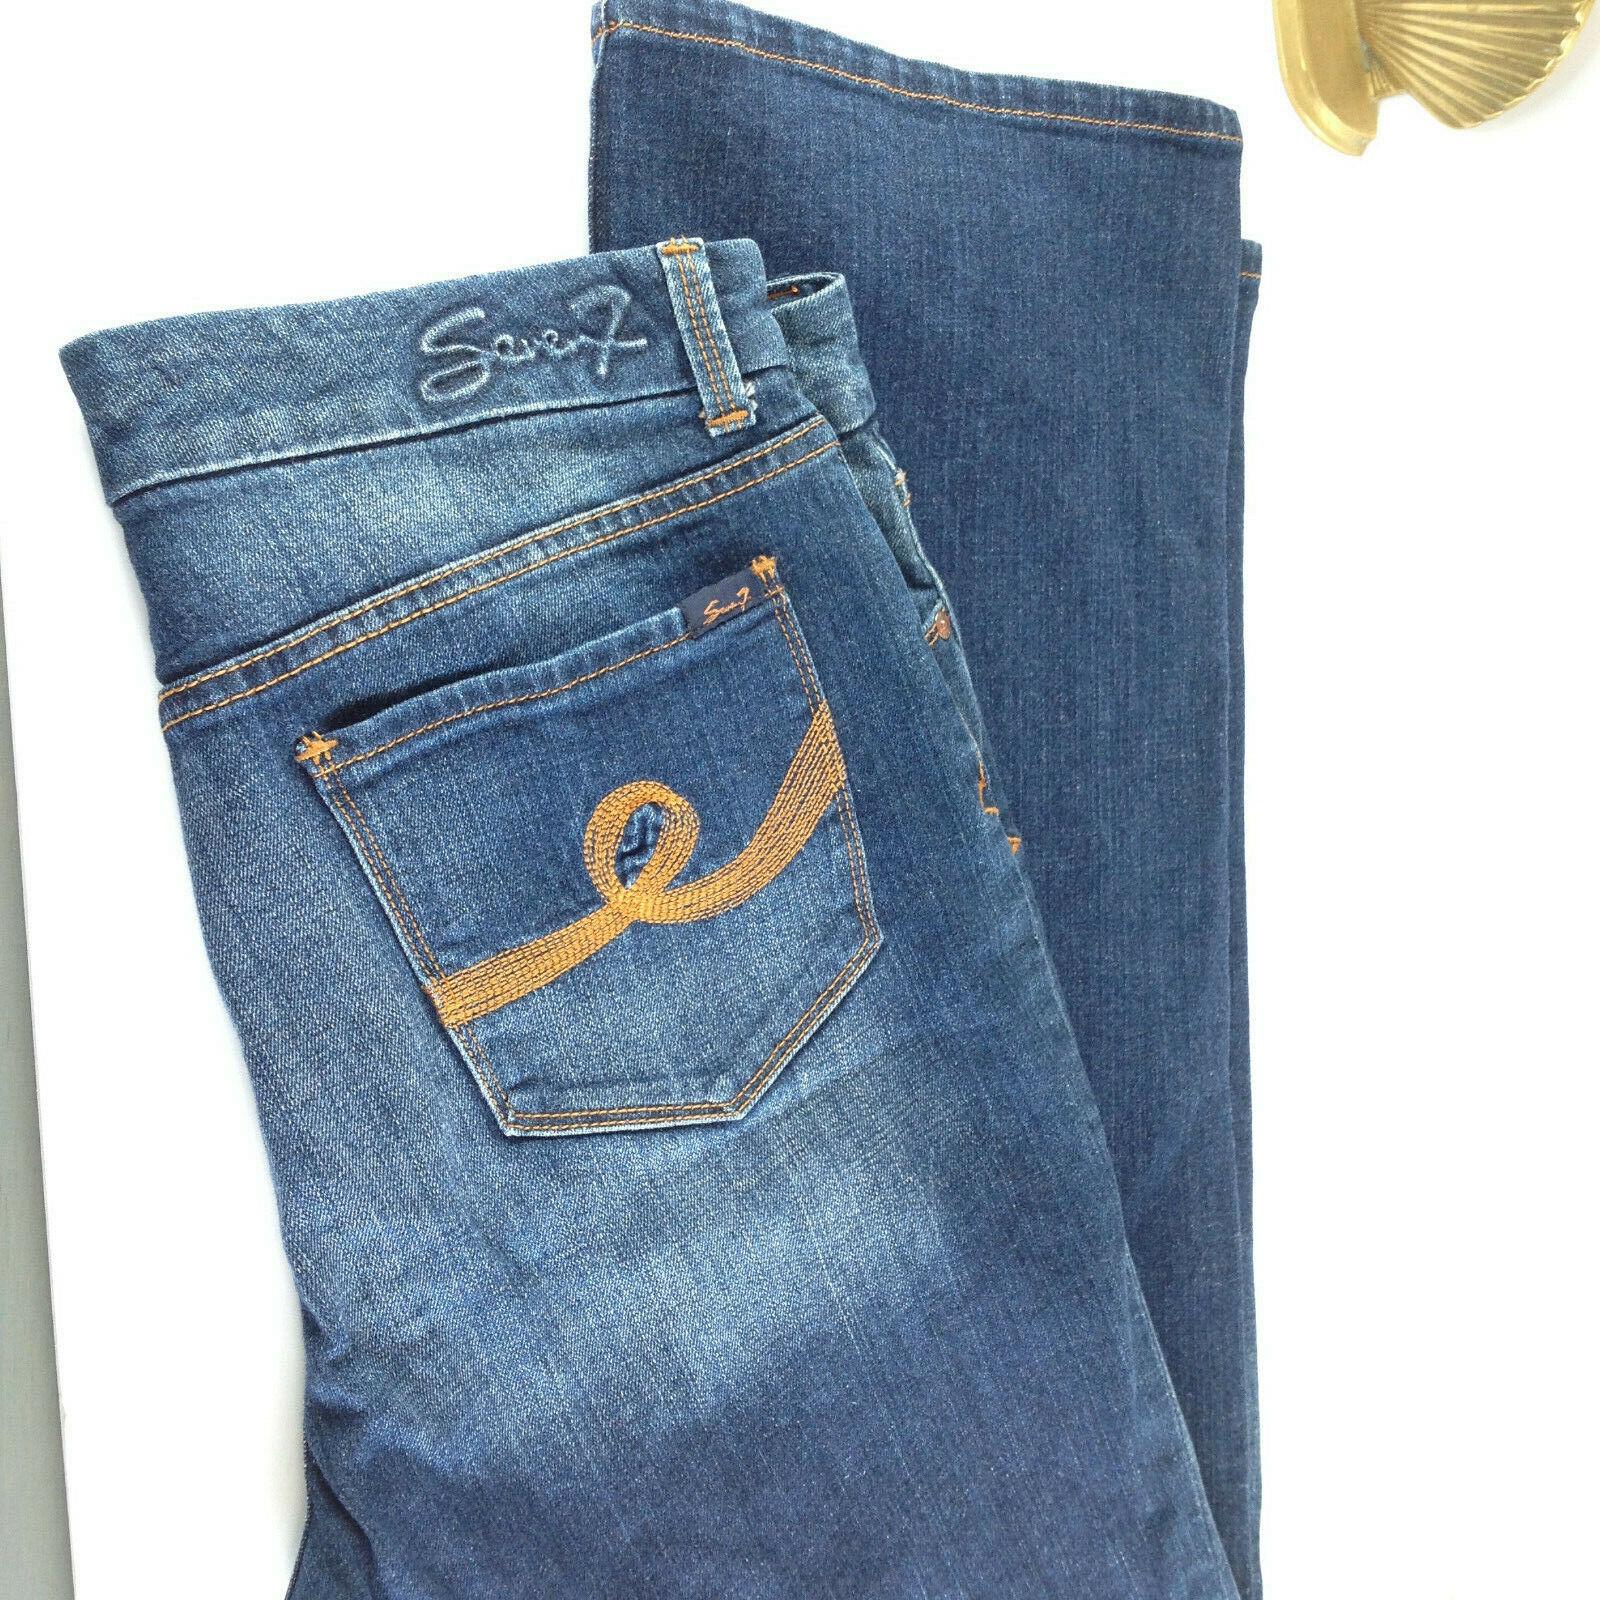 Jeans Seven 7 For All Mankind Size 12 Fits 37  Med-Dark Wash Denim Trouser Boot